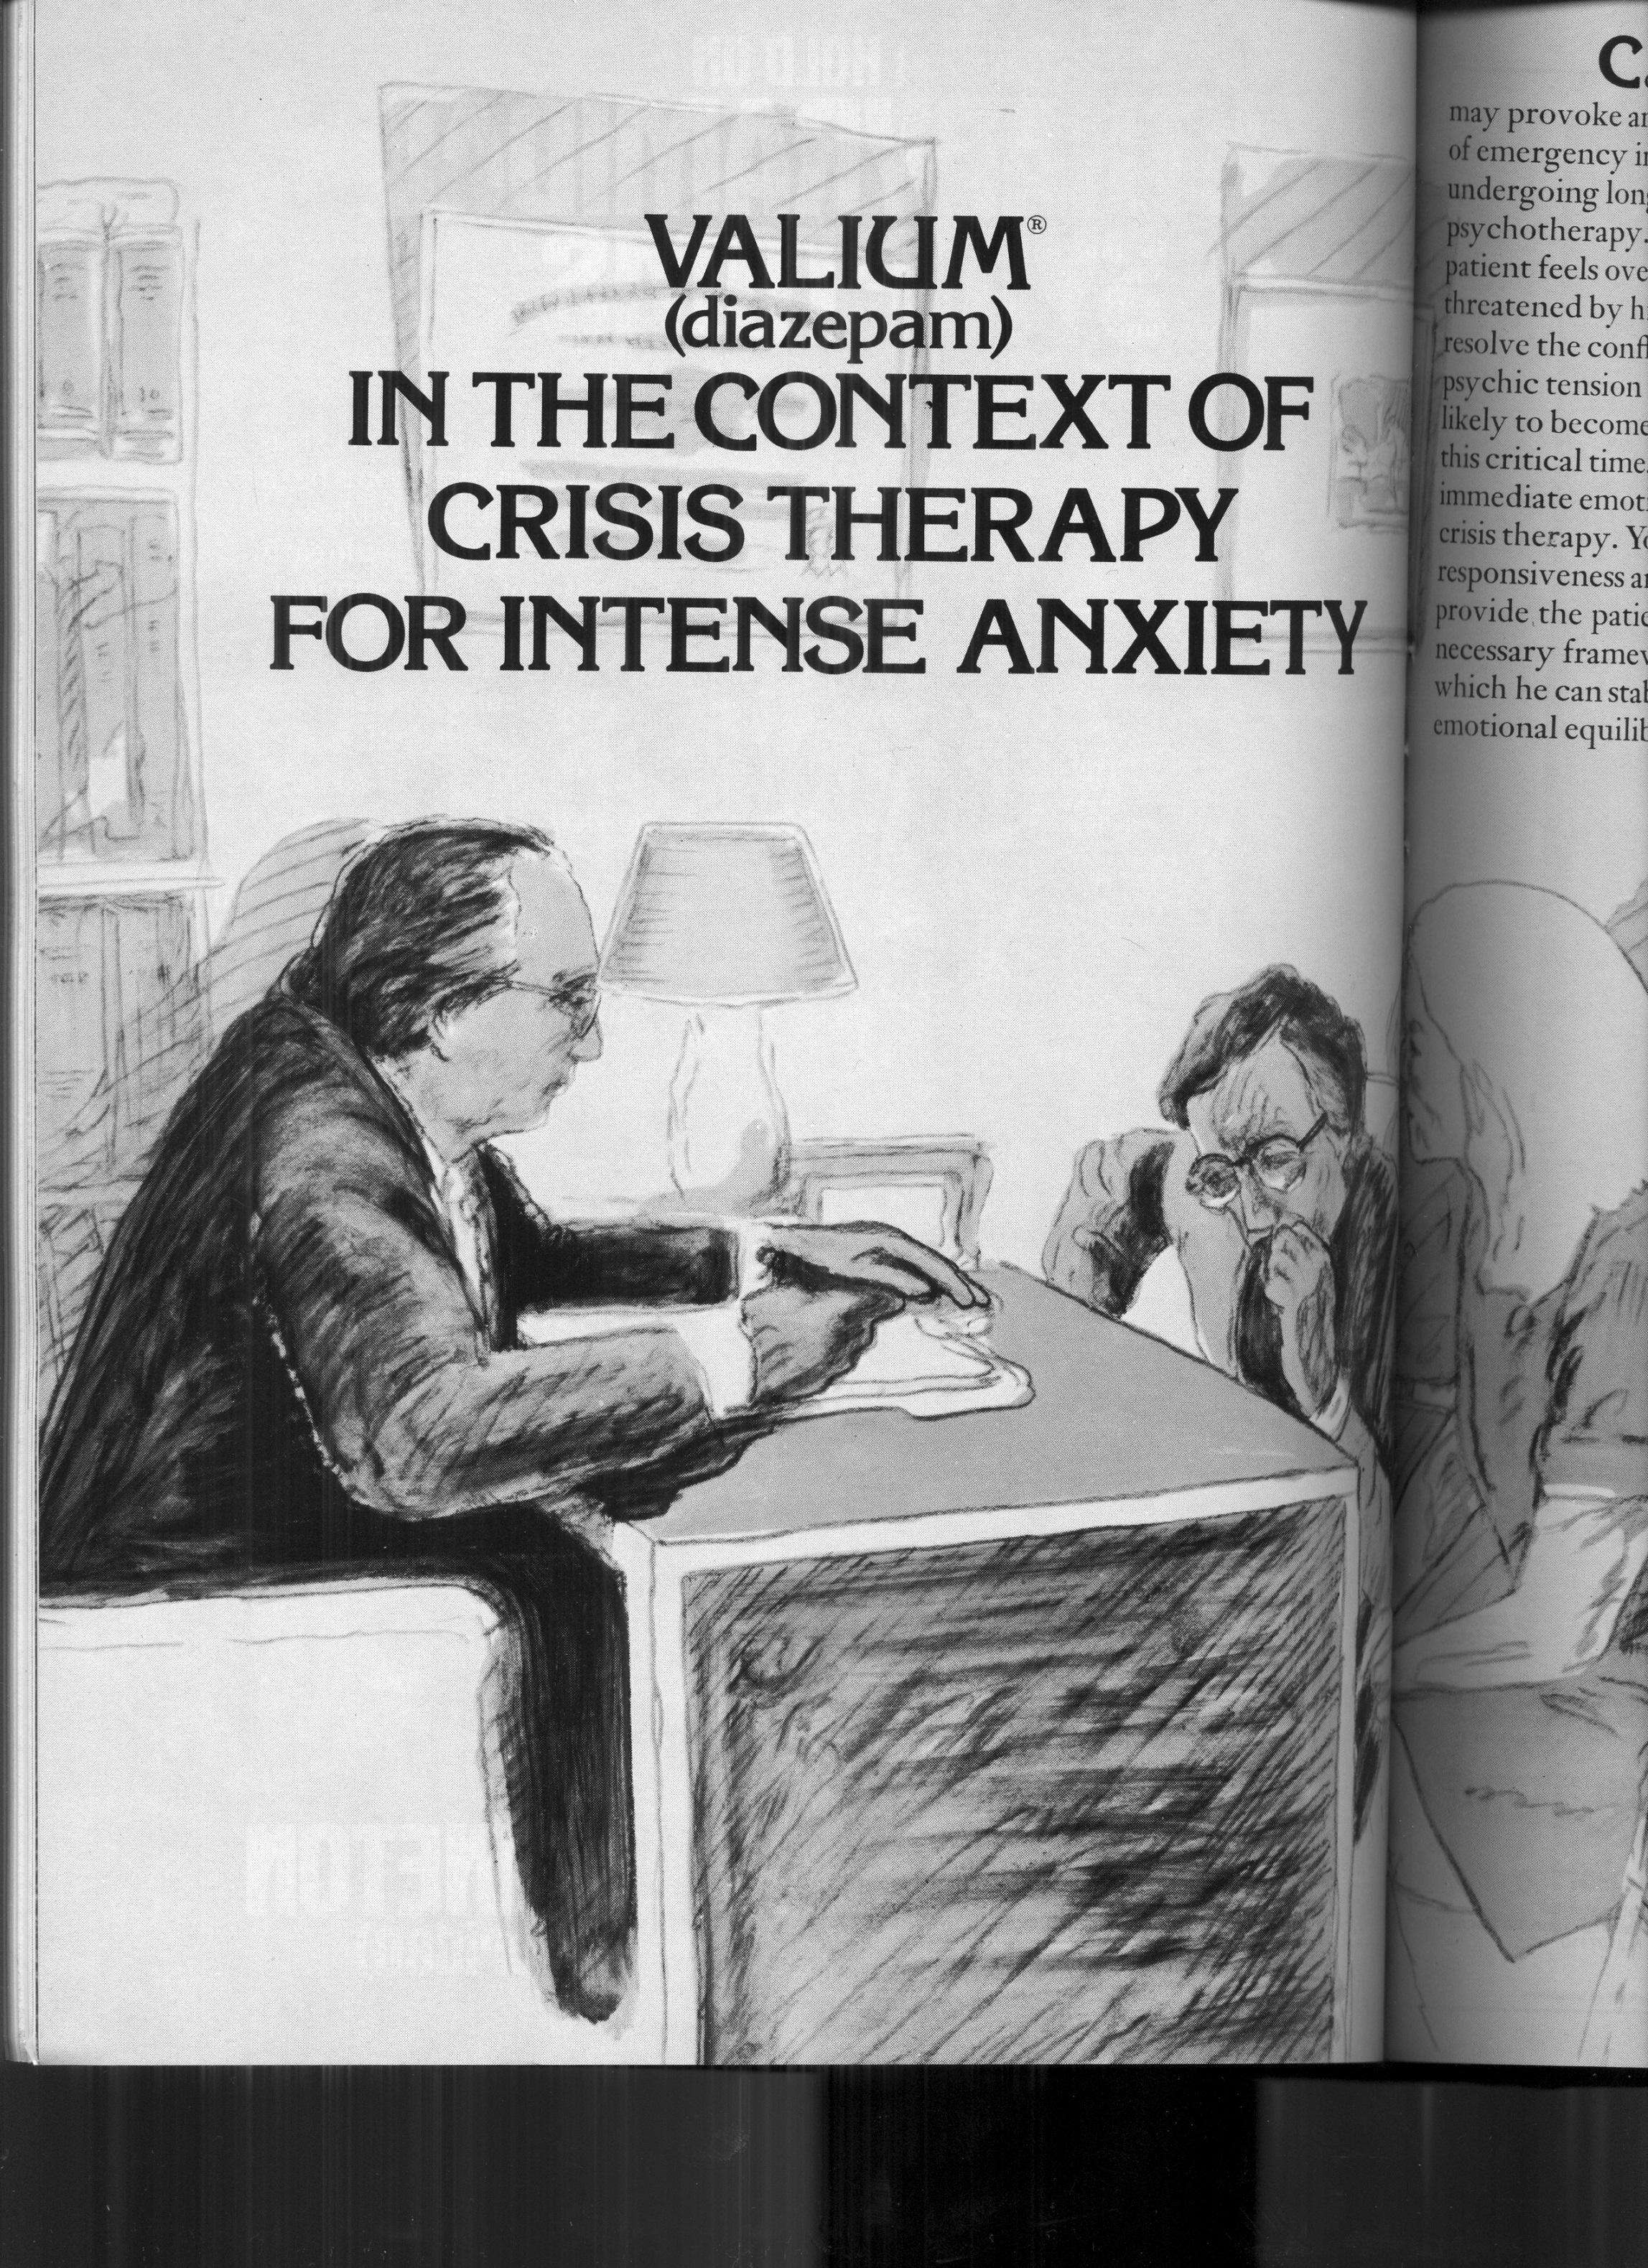 In Defense of Anti-Psychiatry - Mad In America